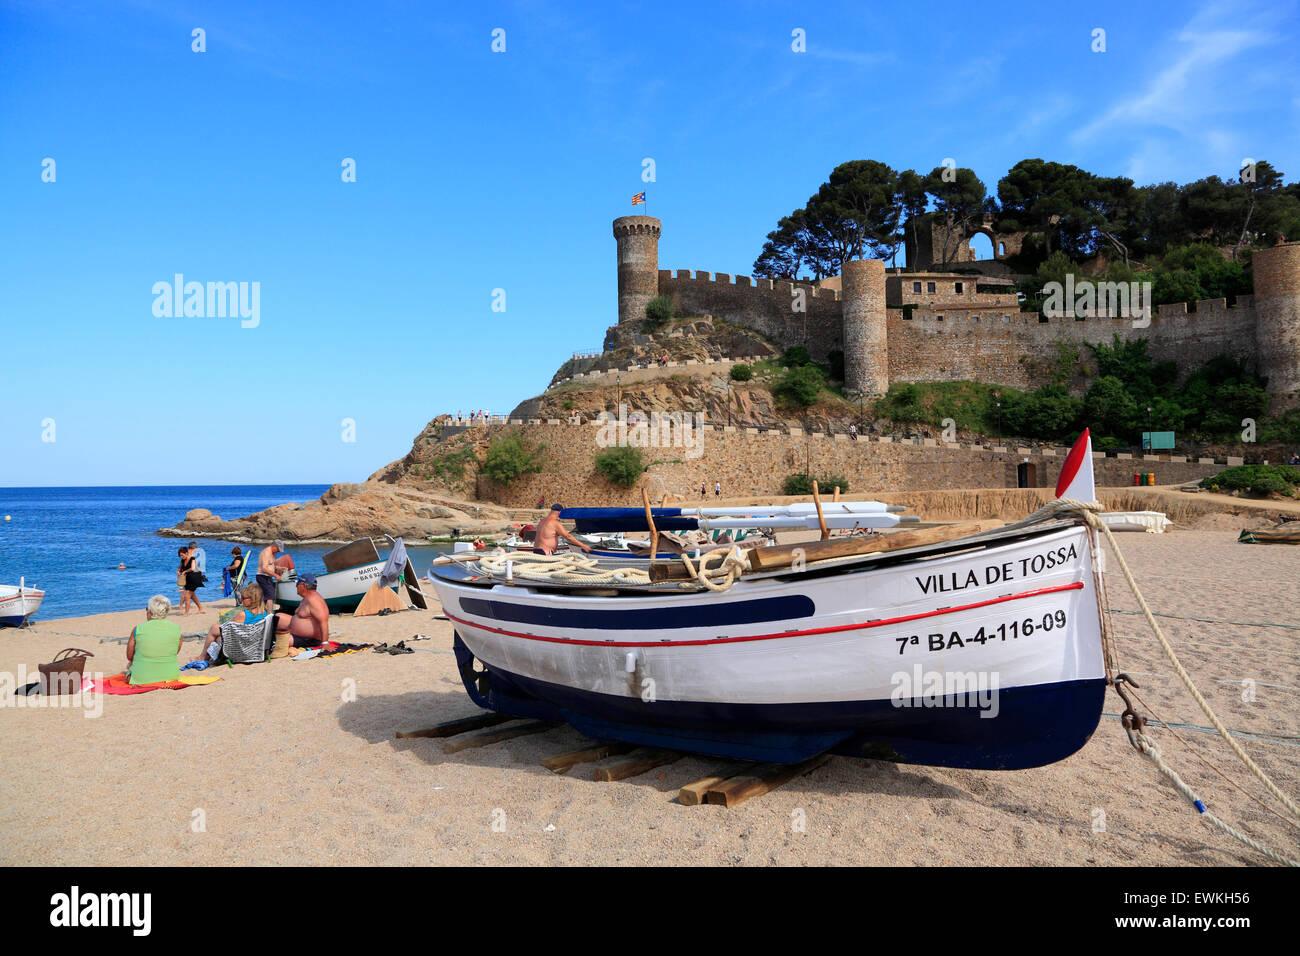 Tossa de Mar, boat on the beach, Costa Brava, Catalona, Spain, Europe - Stock Image